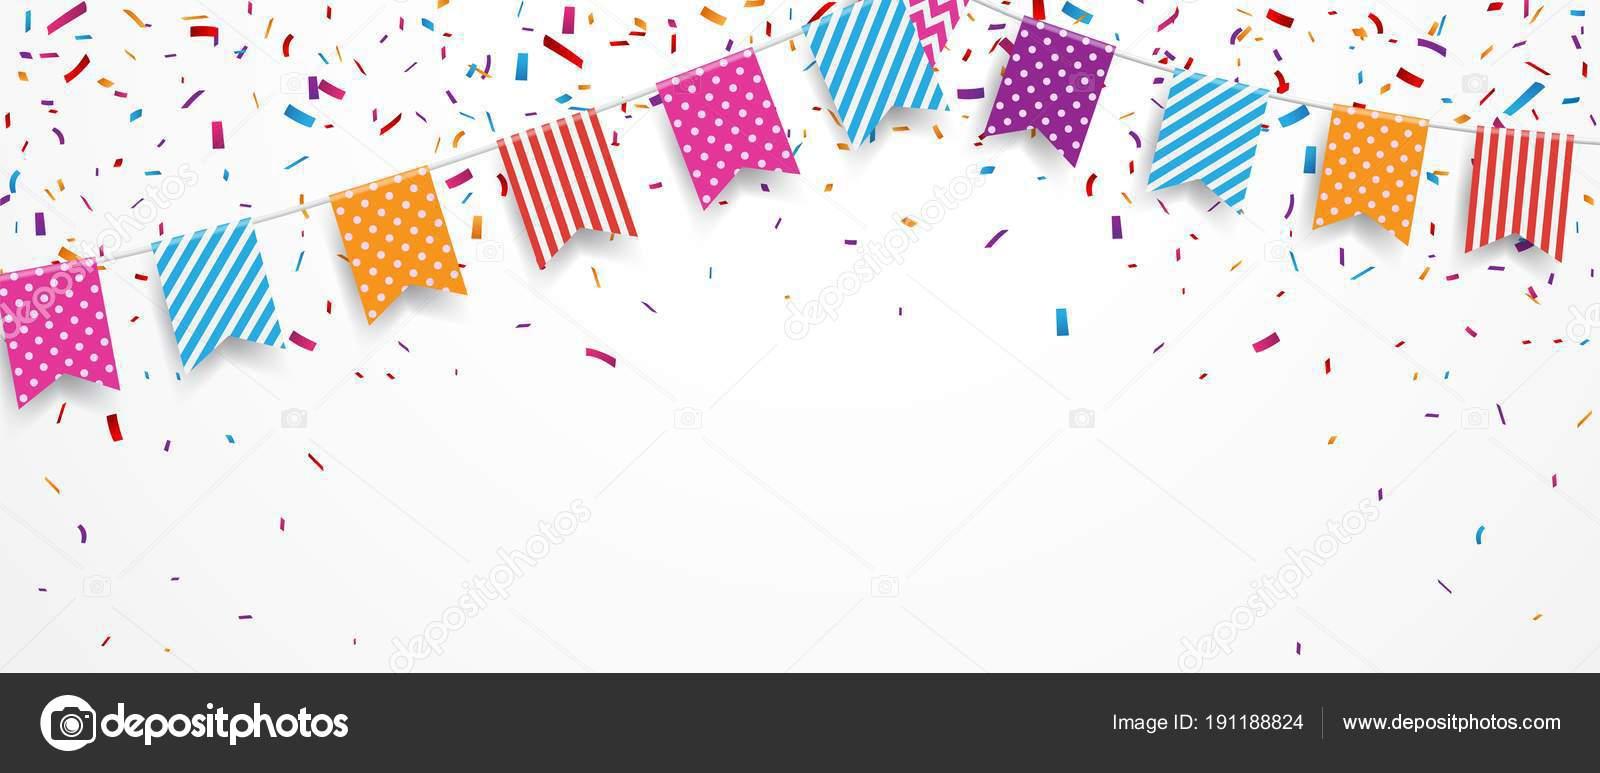 Fondo: marcos cumpleaños png.